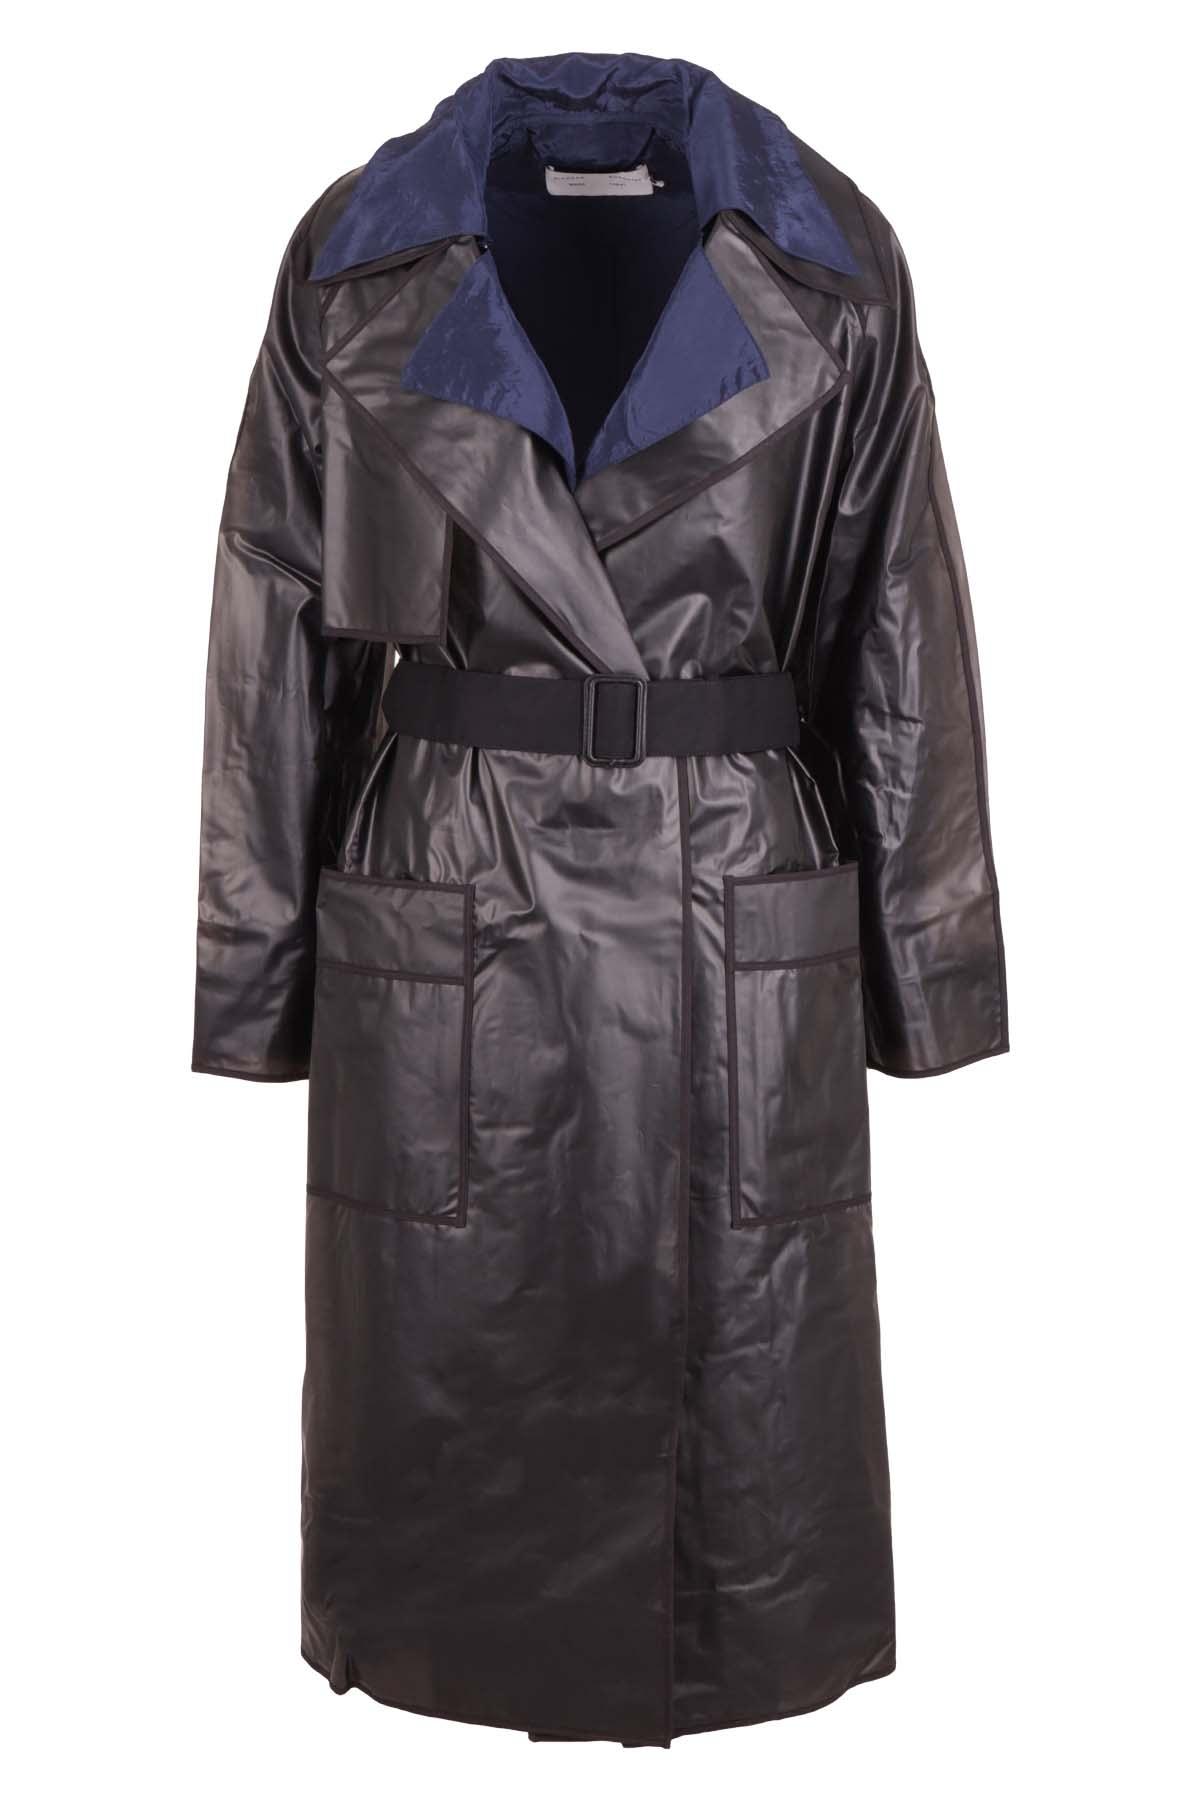 Proenza Schouler Raincoat